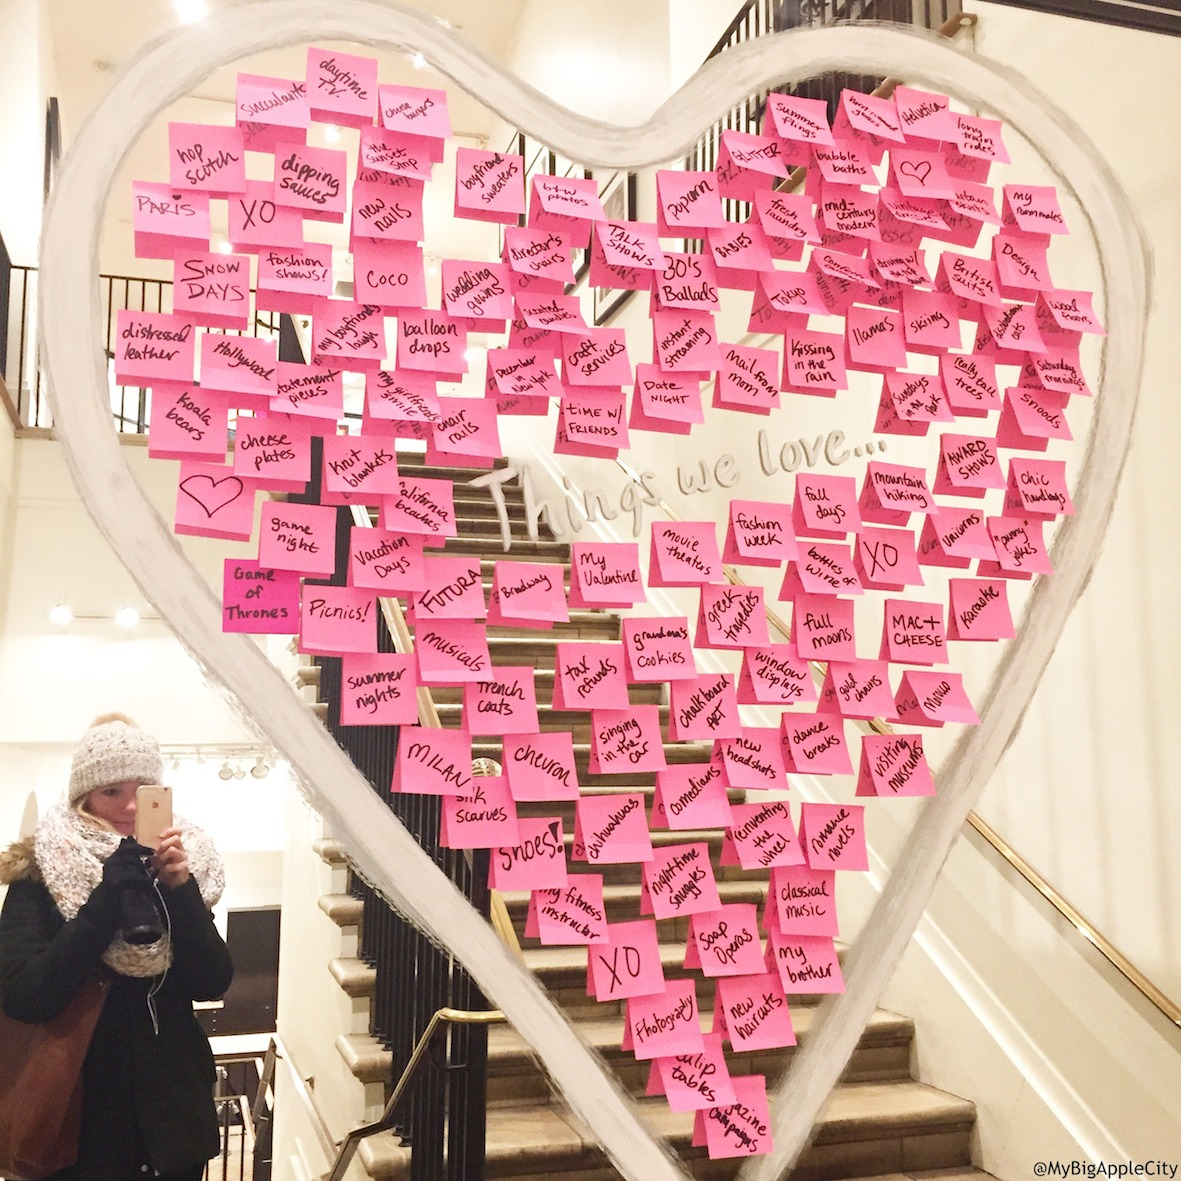 MyBigAppleCity-new-york-blog-lifestyle-heart